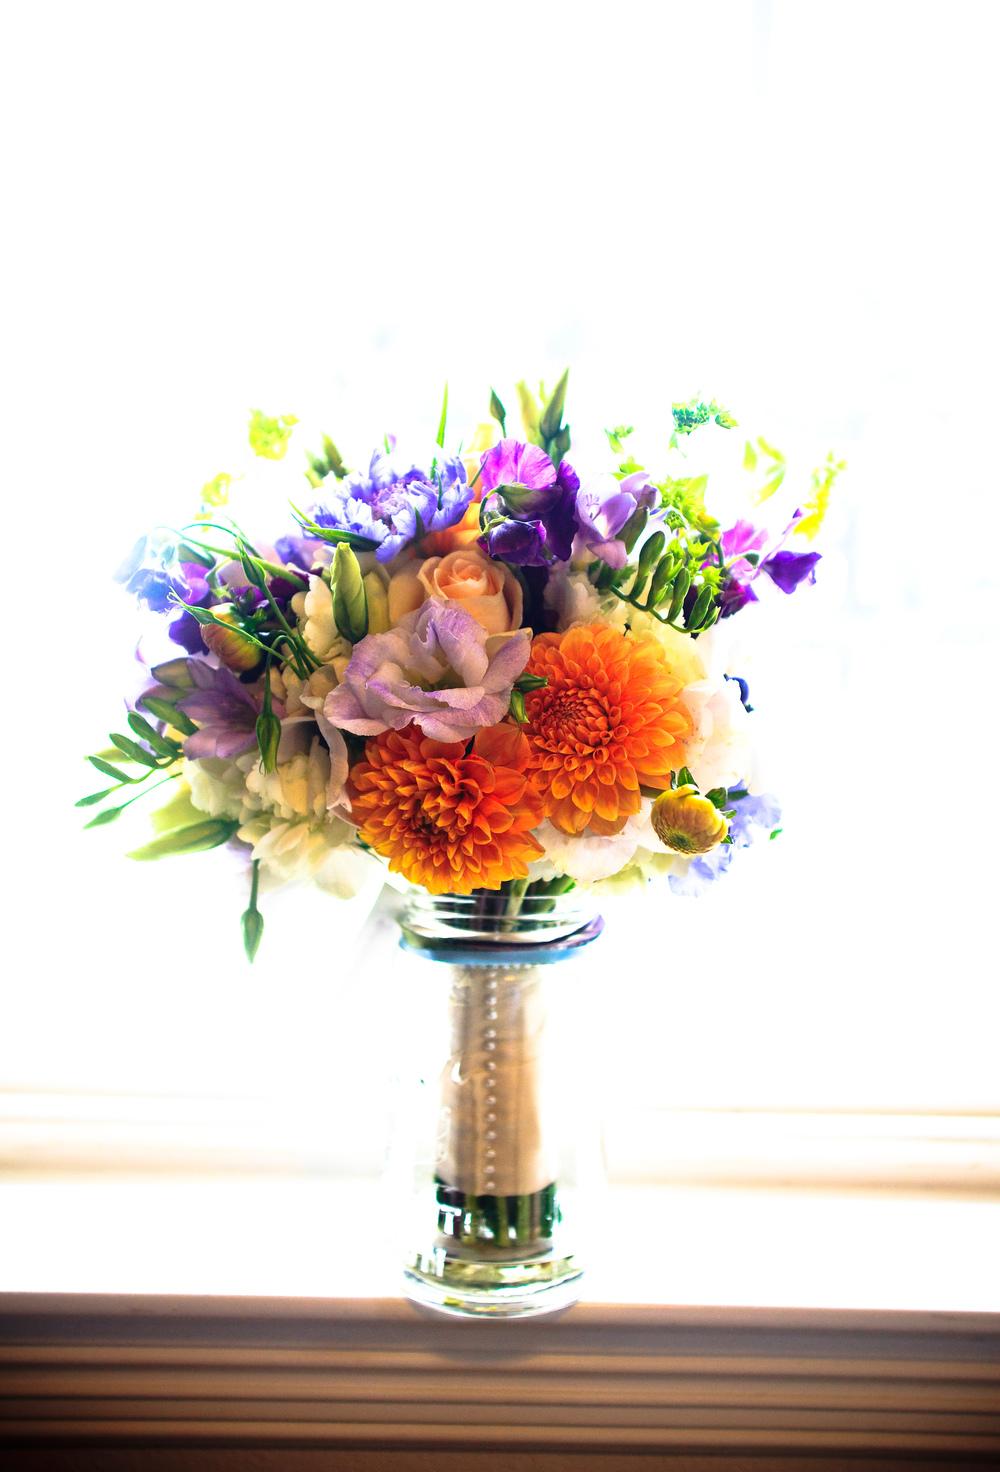 © Kris Holland Photography. www.krishollandphotography.com,Floral Design byAngie Zimmerman Floral Design